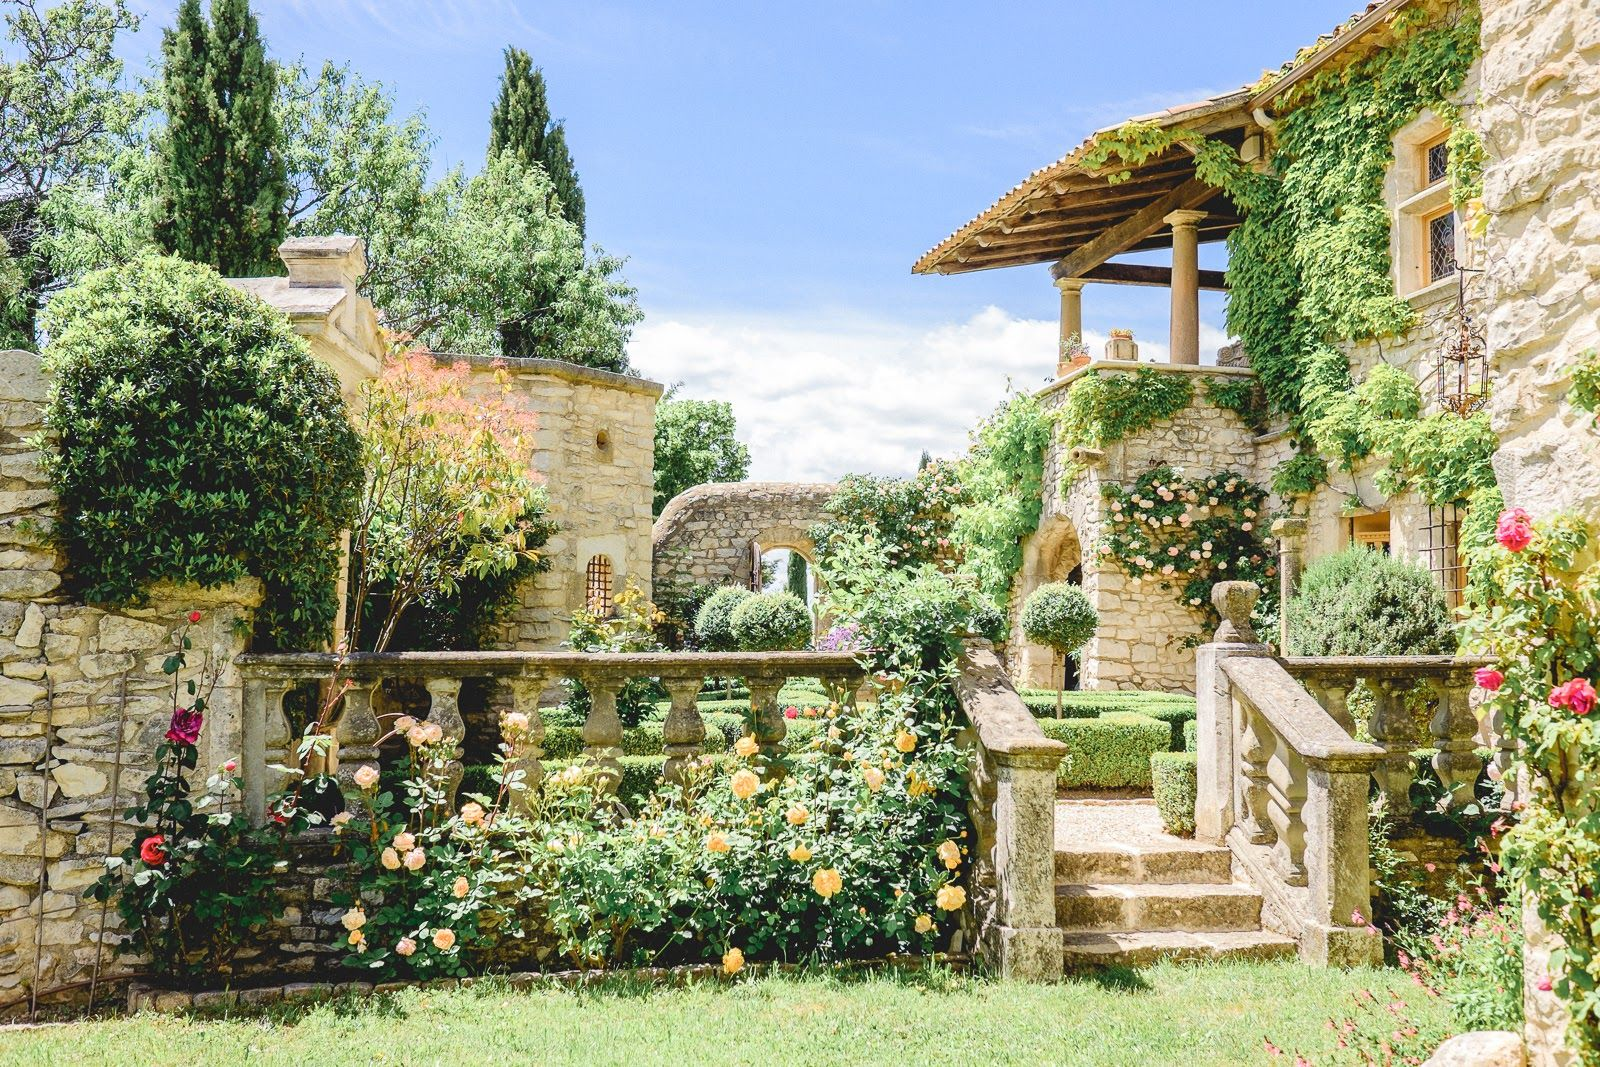 Wedding Venue In France Provance Wedding Castle Wedding Venue France Intimate Wedding Venues Smallest Wedding Venue